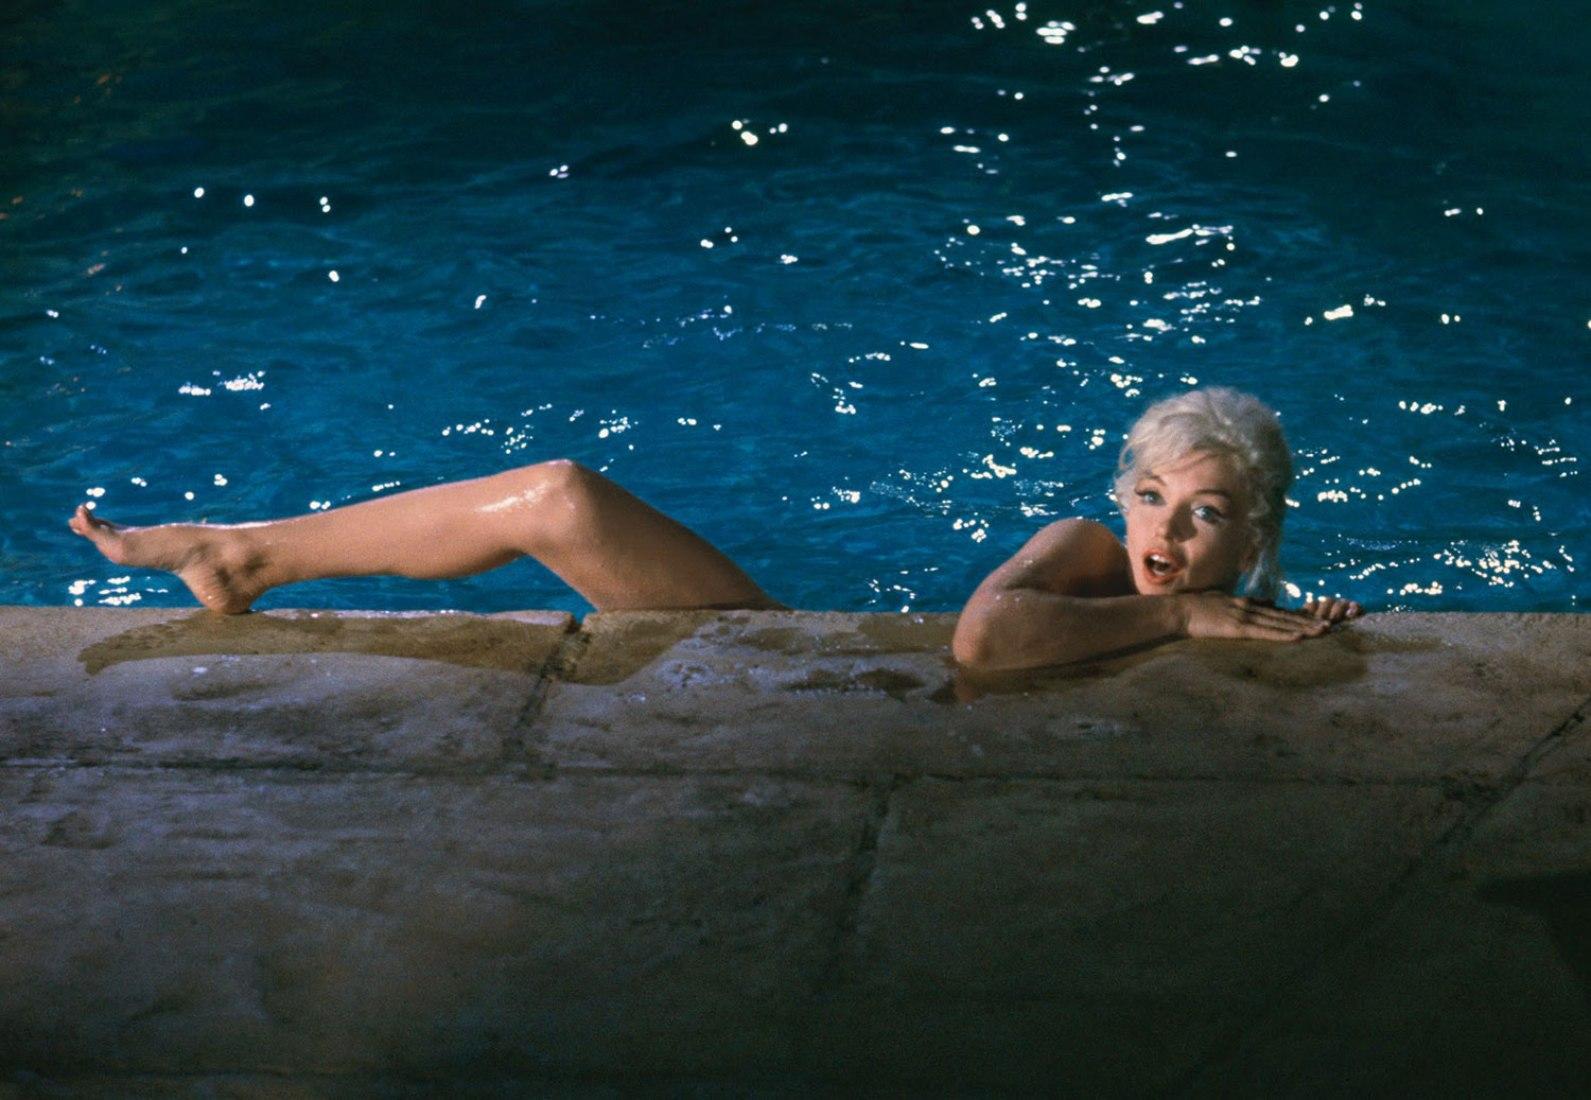 Backyard Oasis ( Lawrence Schiller ) Marilyn Monroe, 1962 fotografía de  Lawrence Schiller.